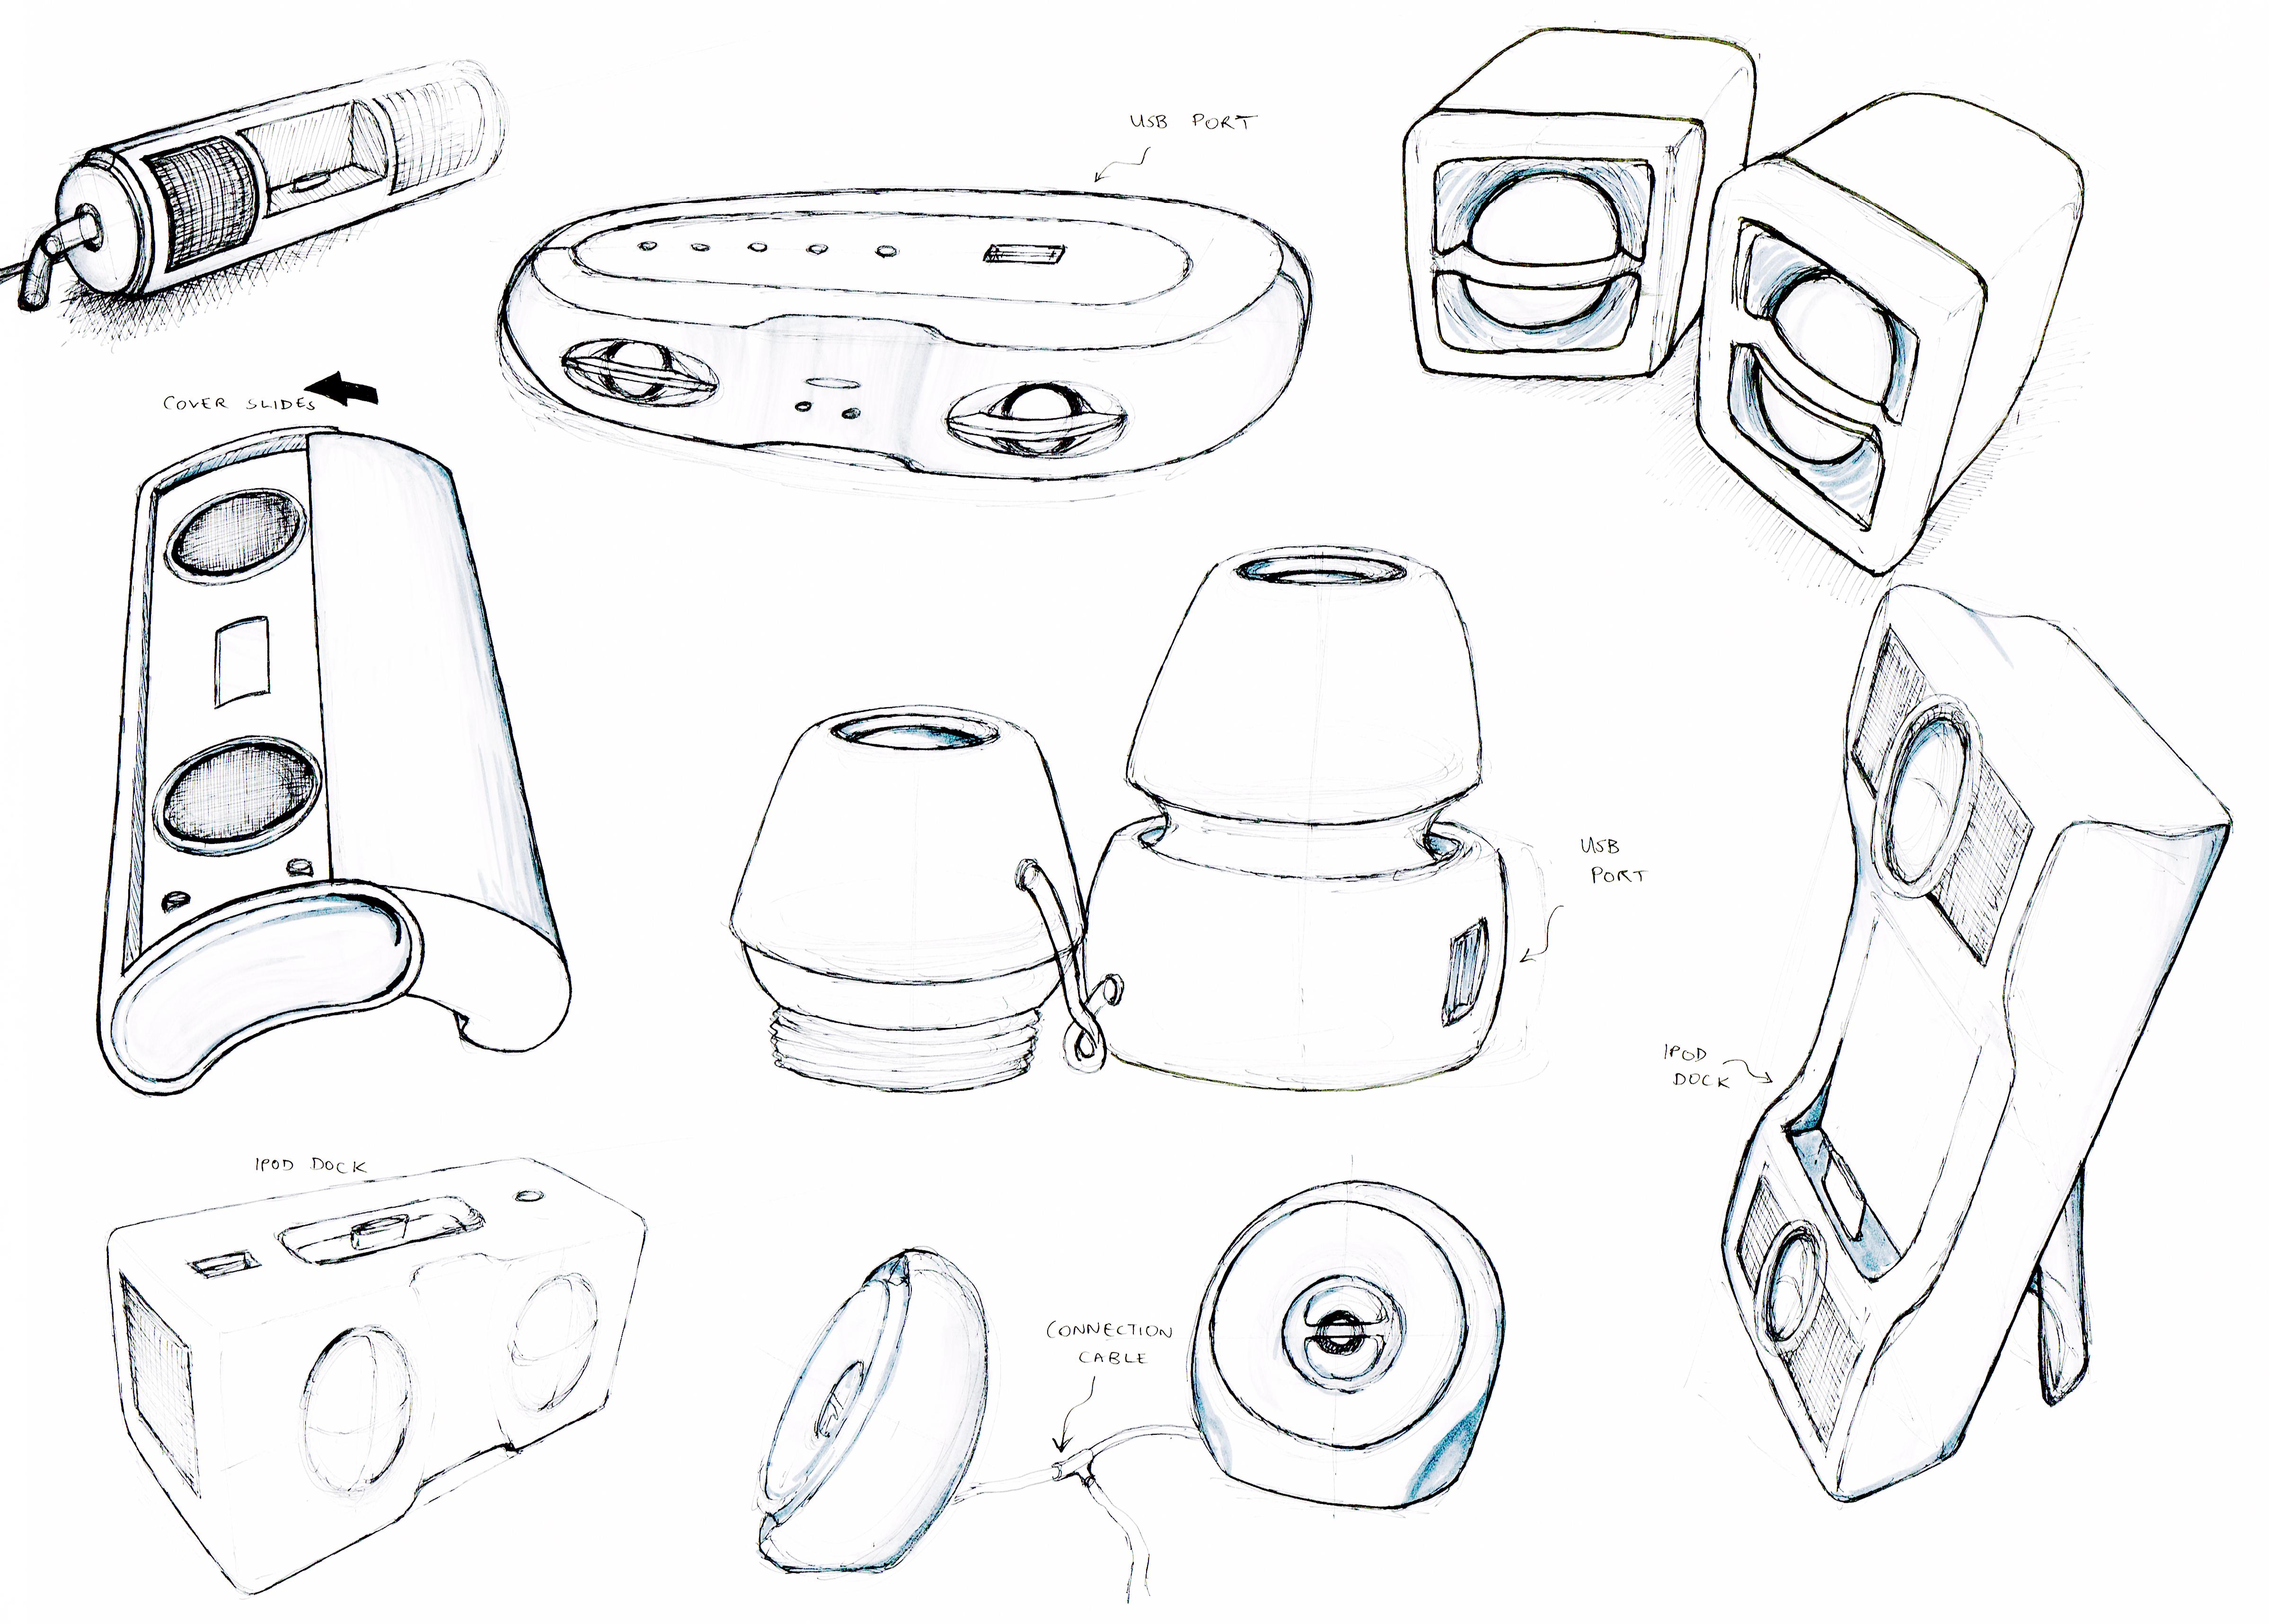 Speakers Sketch page 1